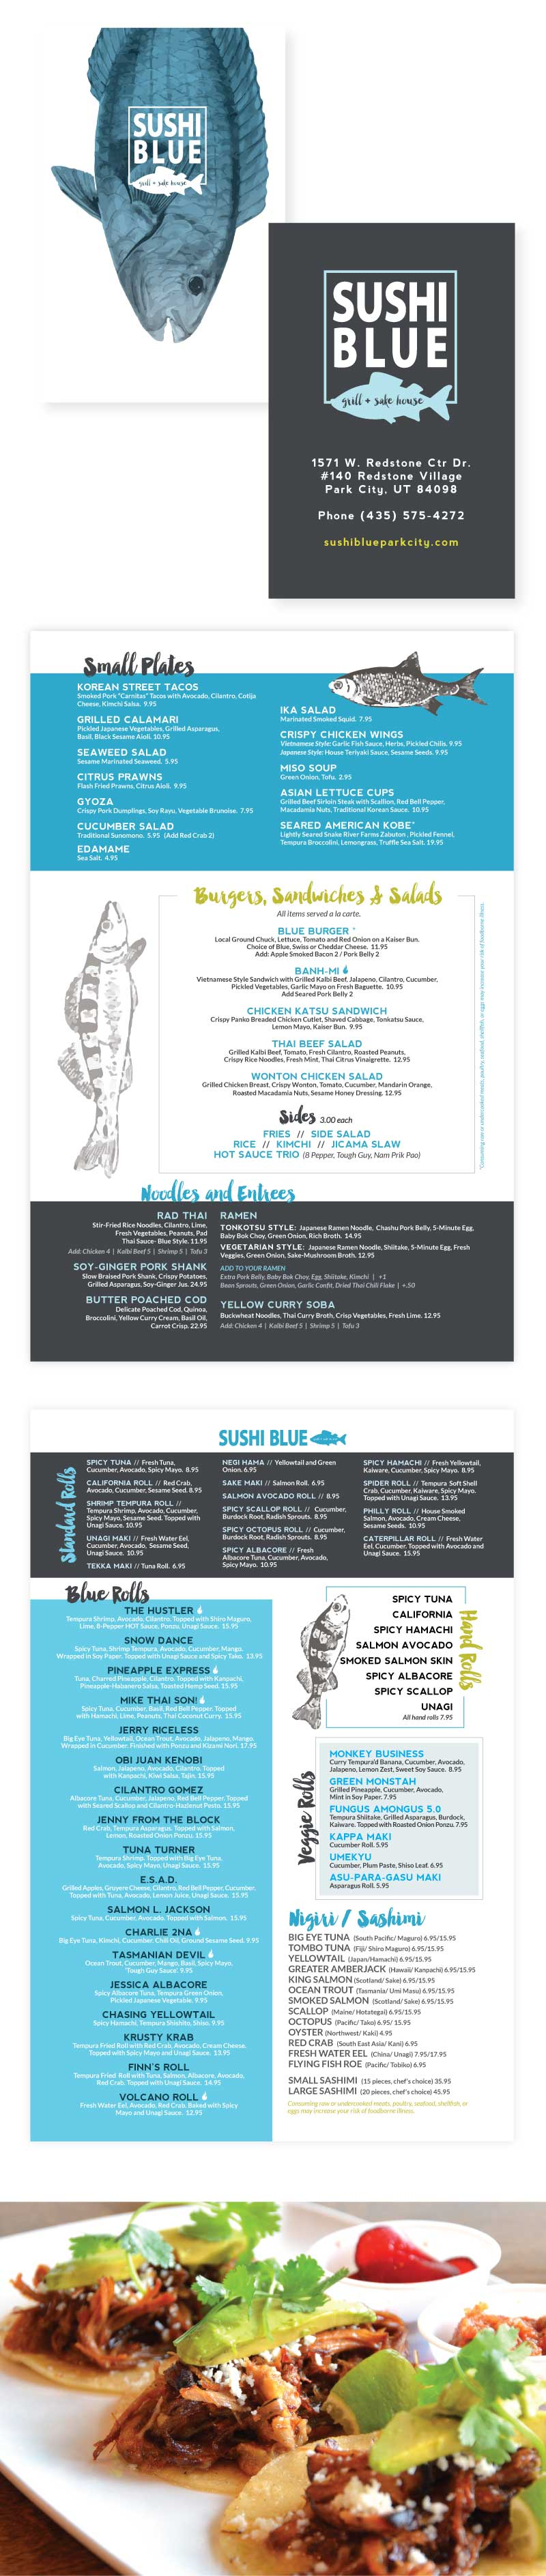 Menu Design for Sushi Blue Restaurant in Park City - Modern Logo and Branding by Dapper Fox Design